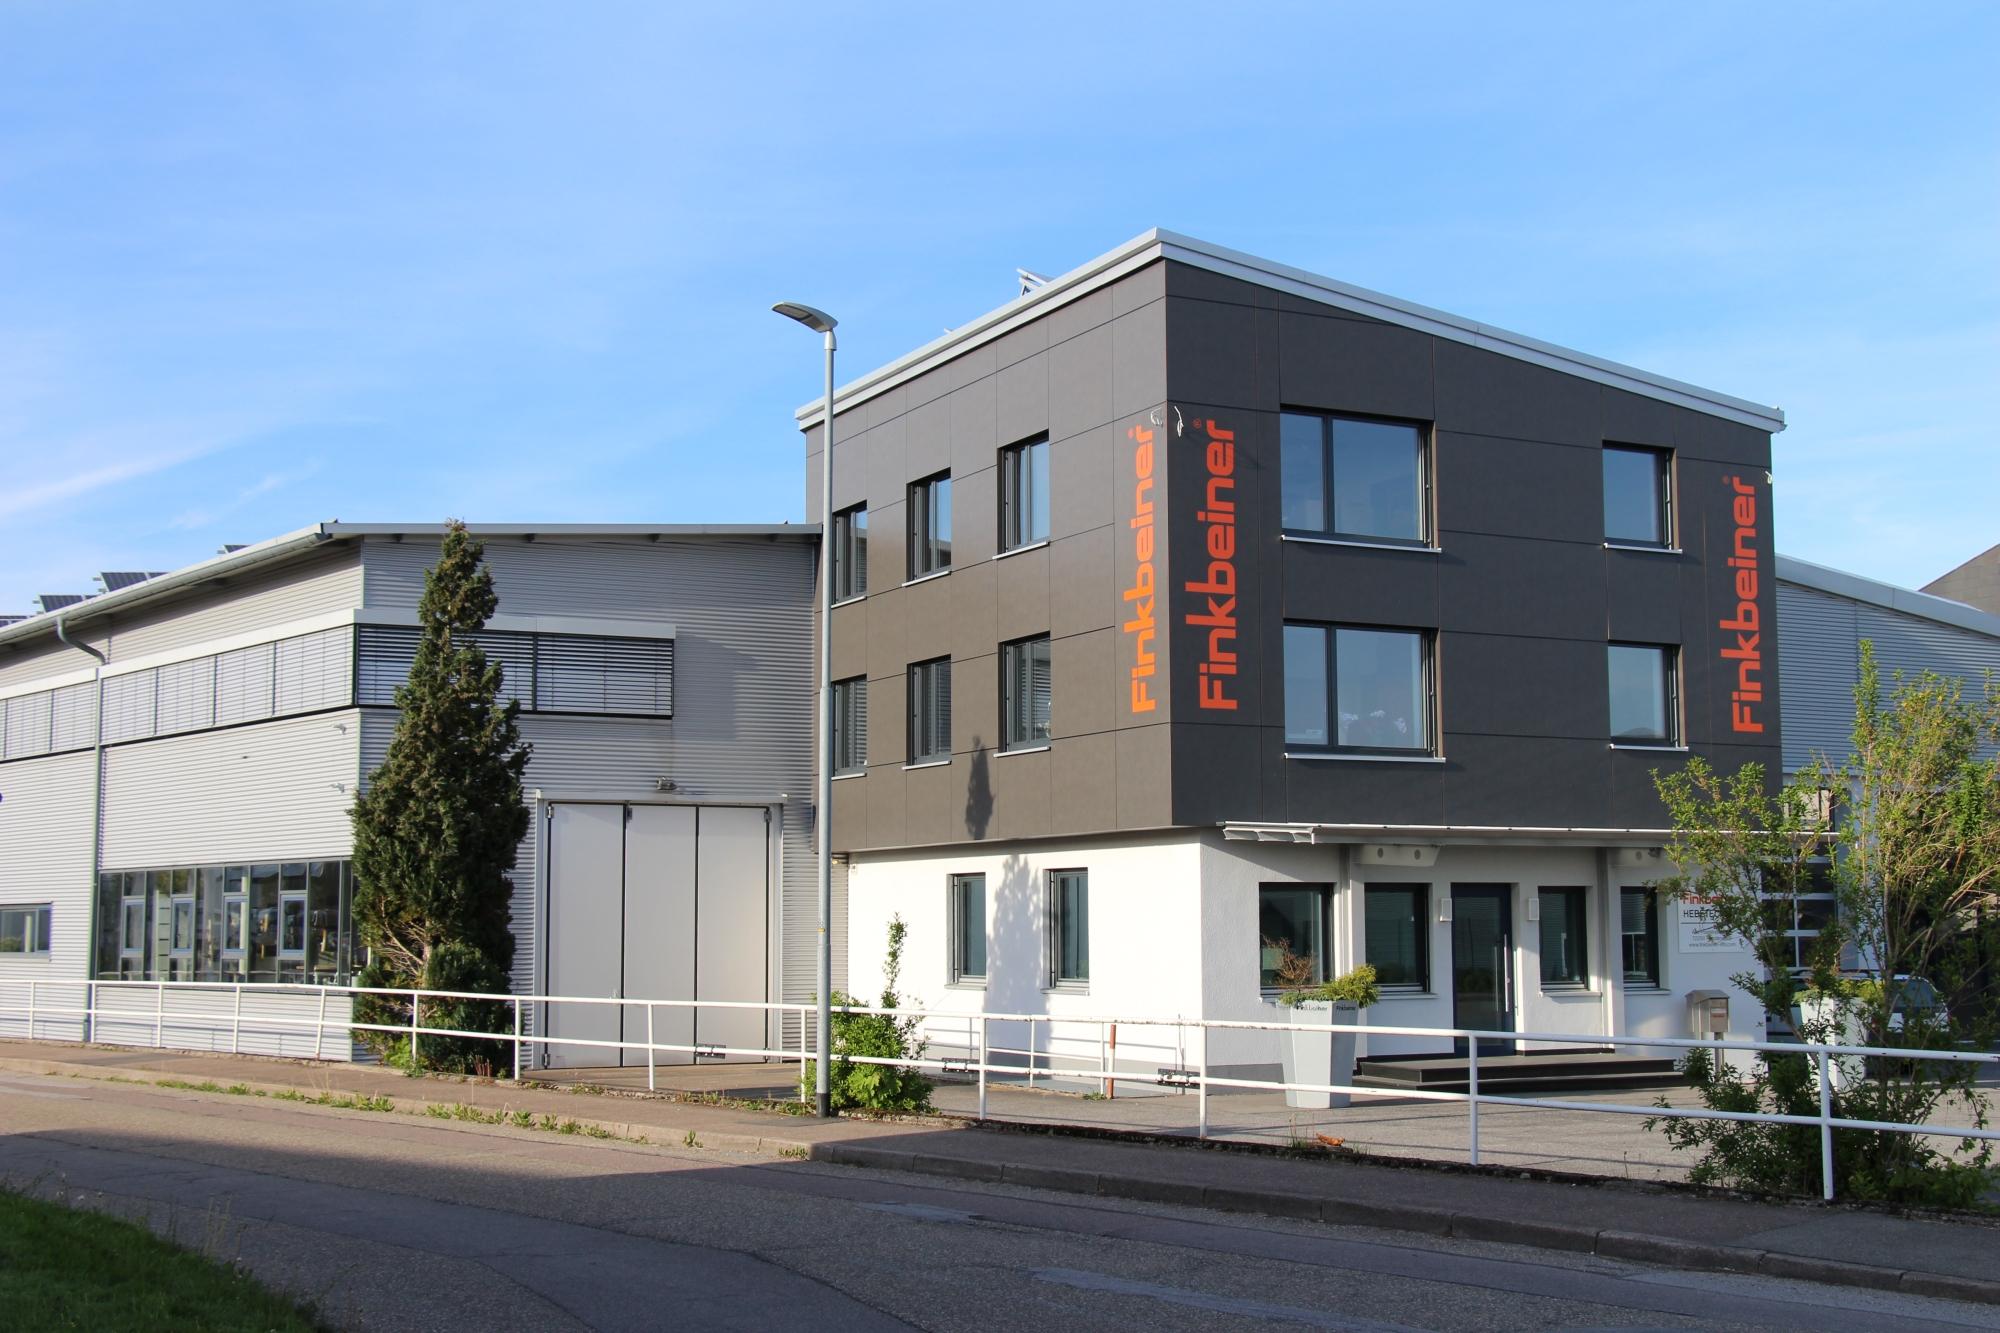 Singles in Freudenstadt - Partnersuche auf ibt-pep.de